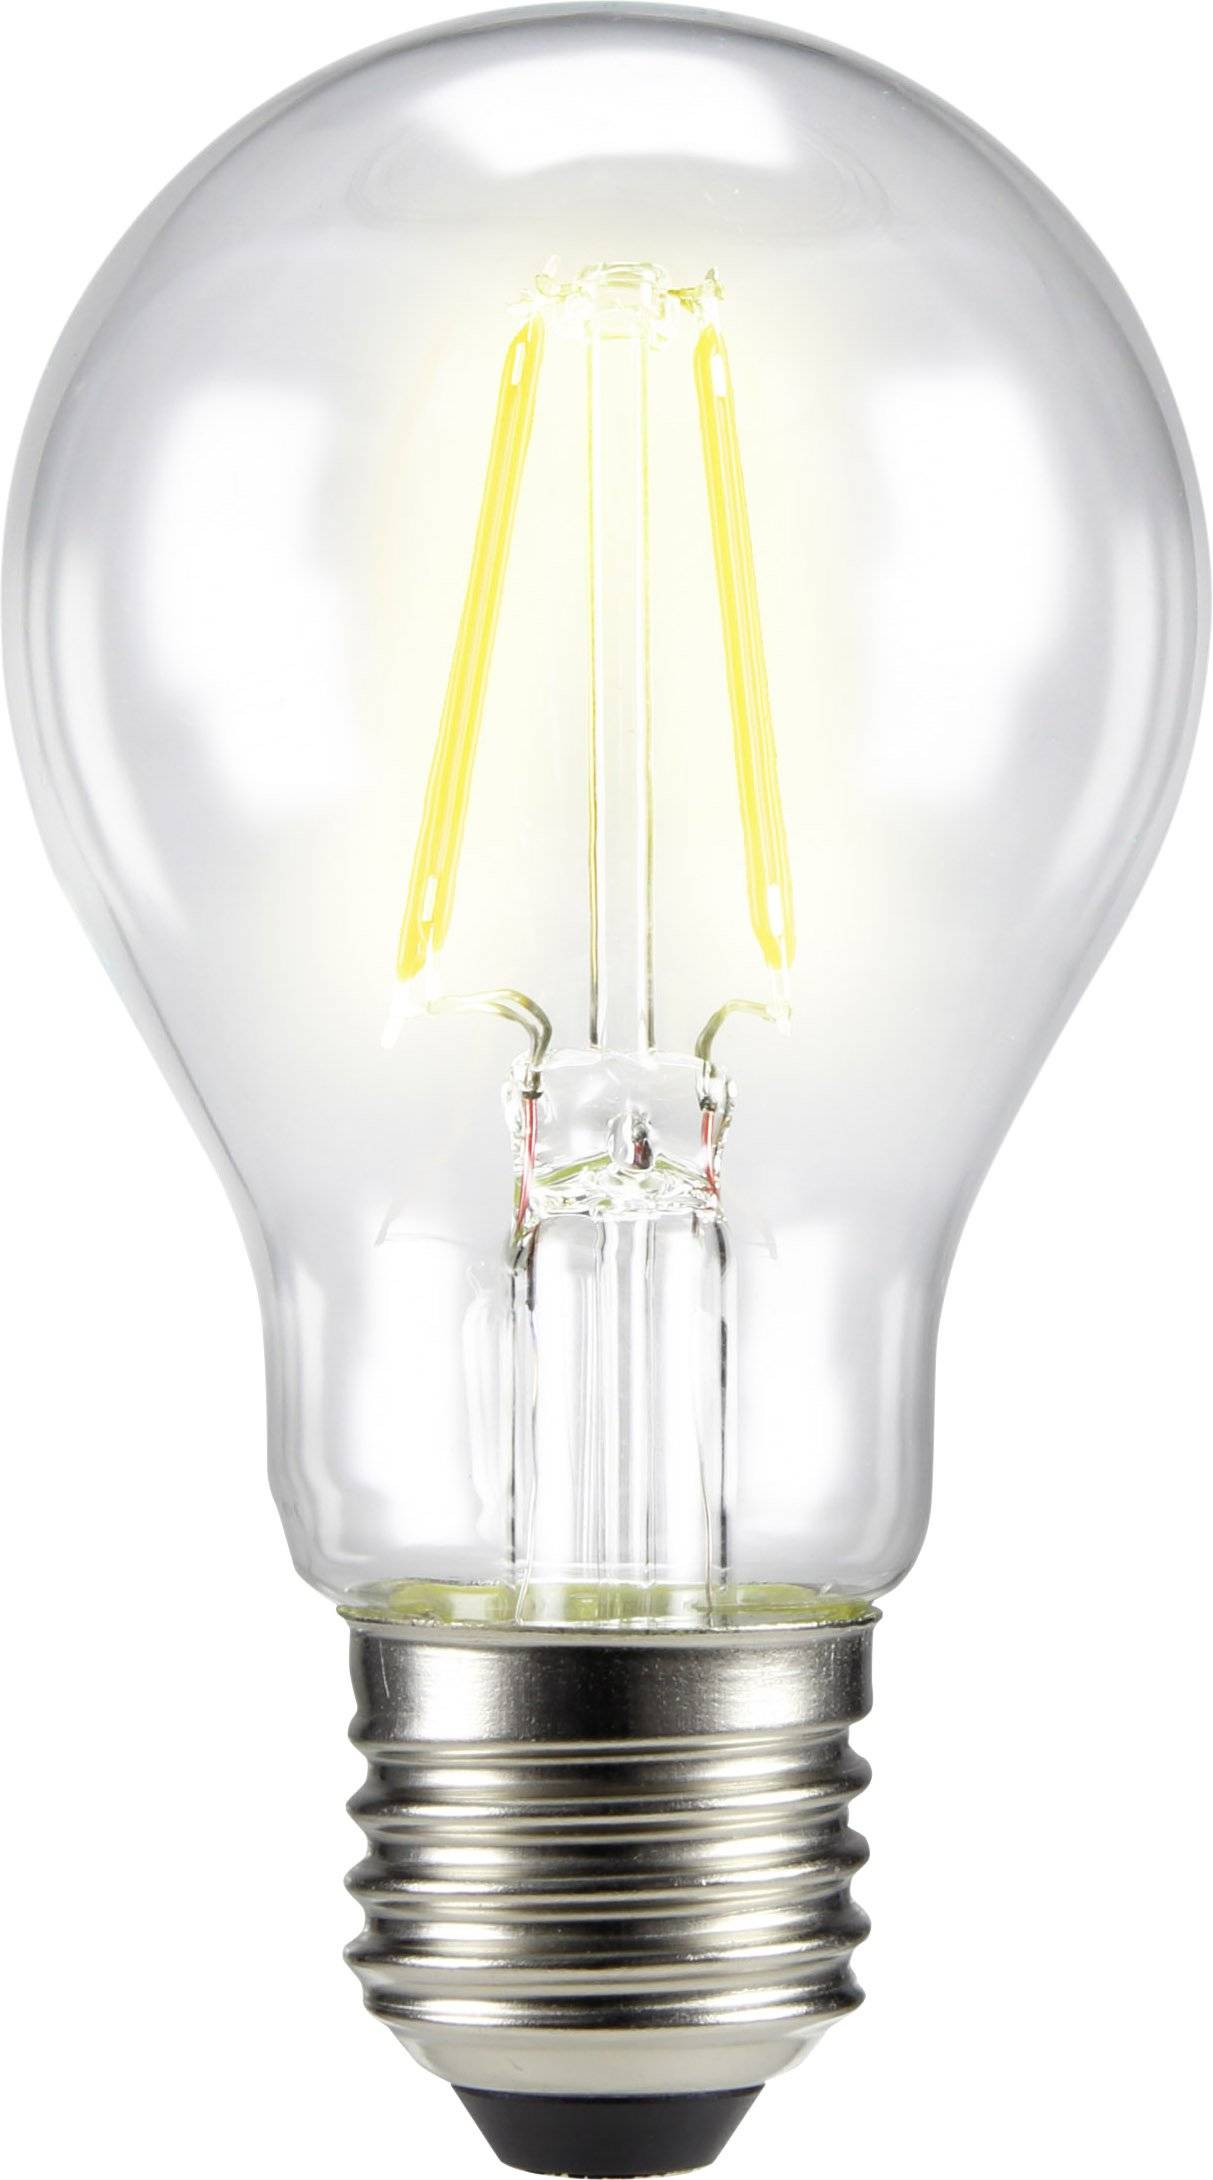 LED žiarovka 105 mm sygonix 230 V 4 W = 40 W vlákno 1 ks